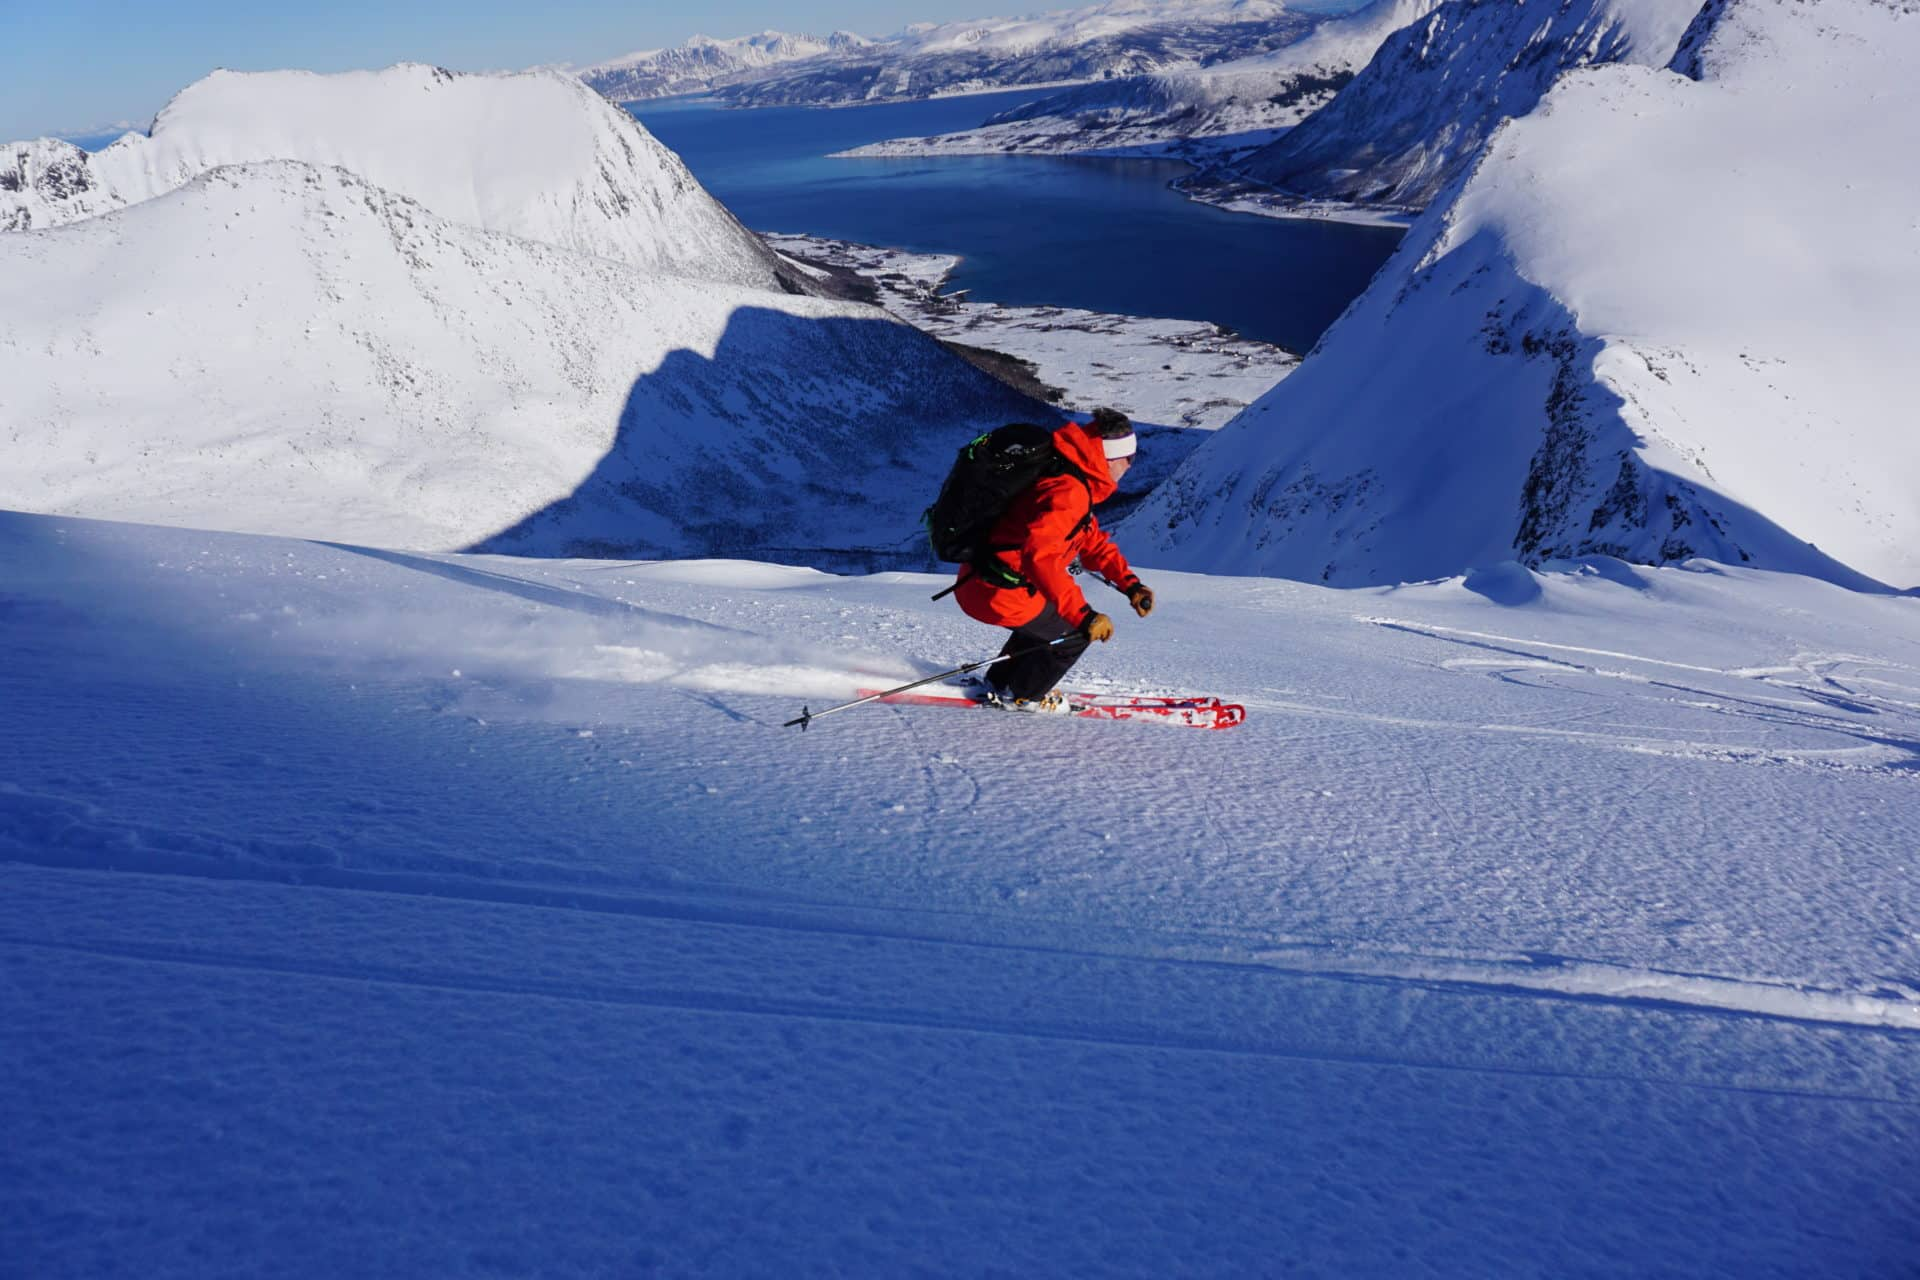 Lofoten ski touring between the sea and mountain